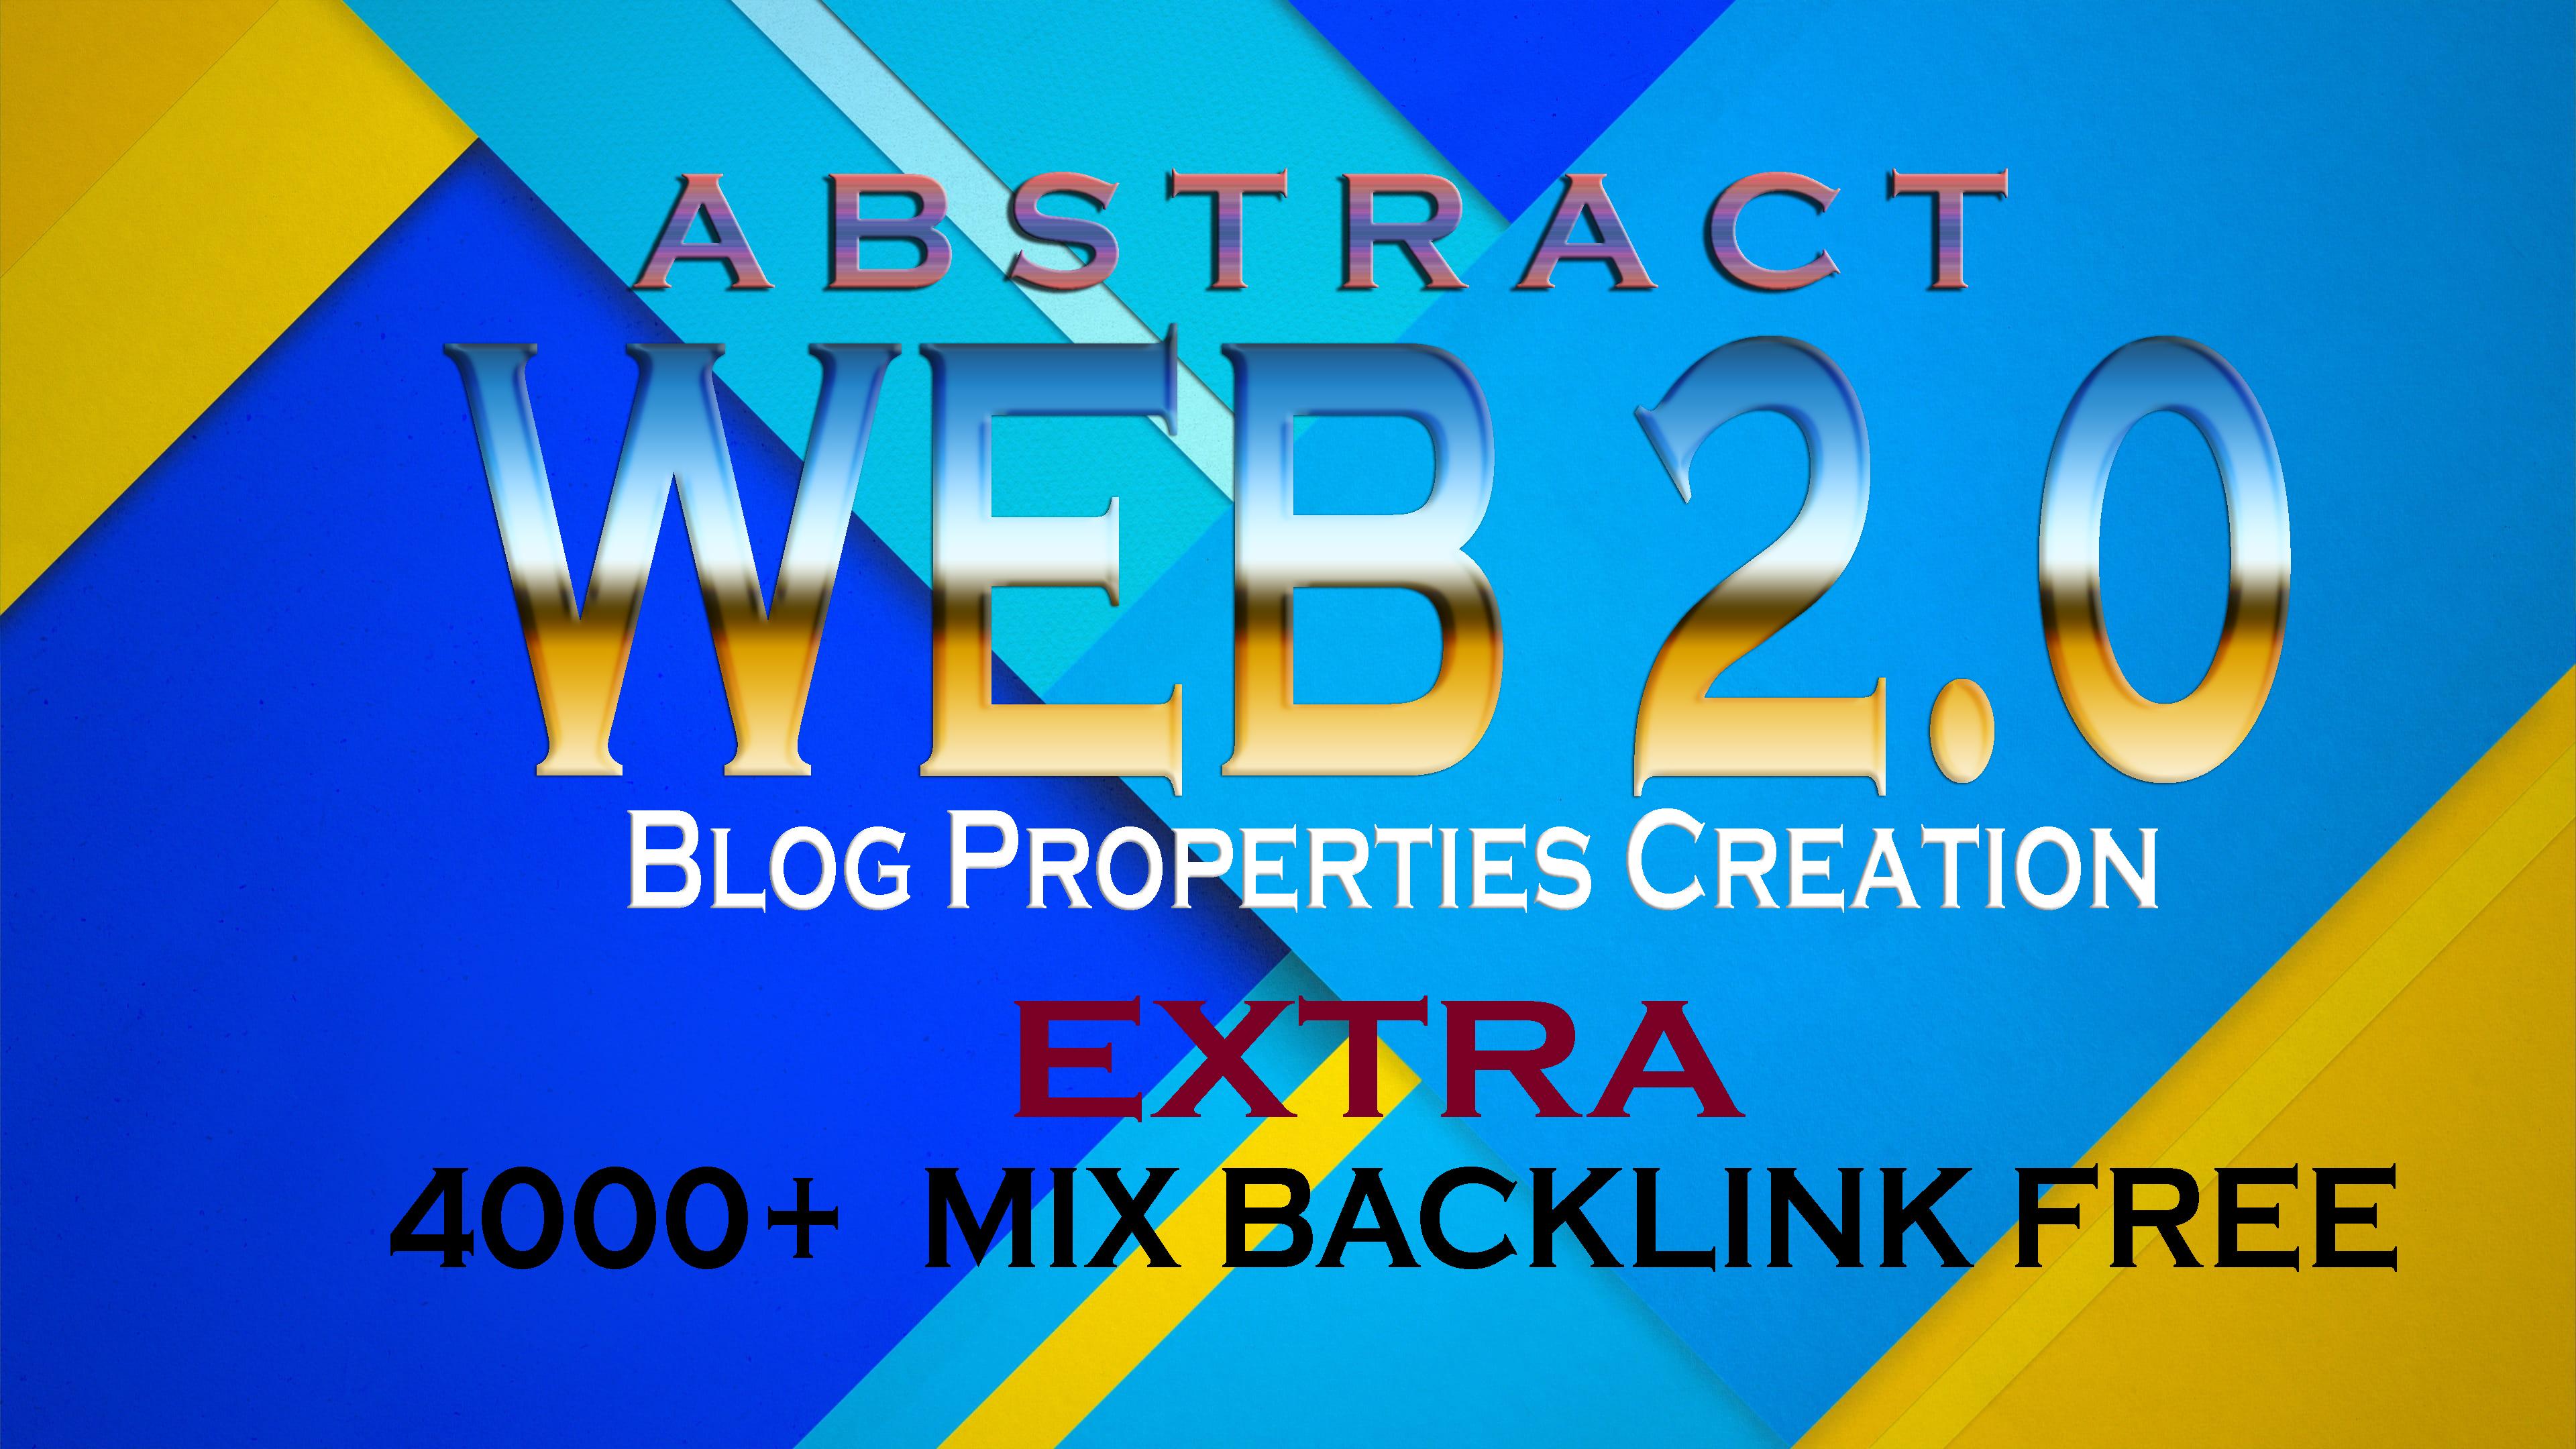 i will provide you High DA Manually created 5 web 2.0 blog with extra 4000+ tire 2 backlink